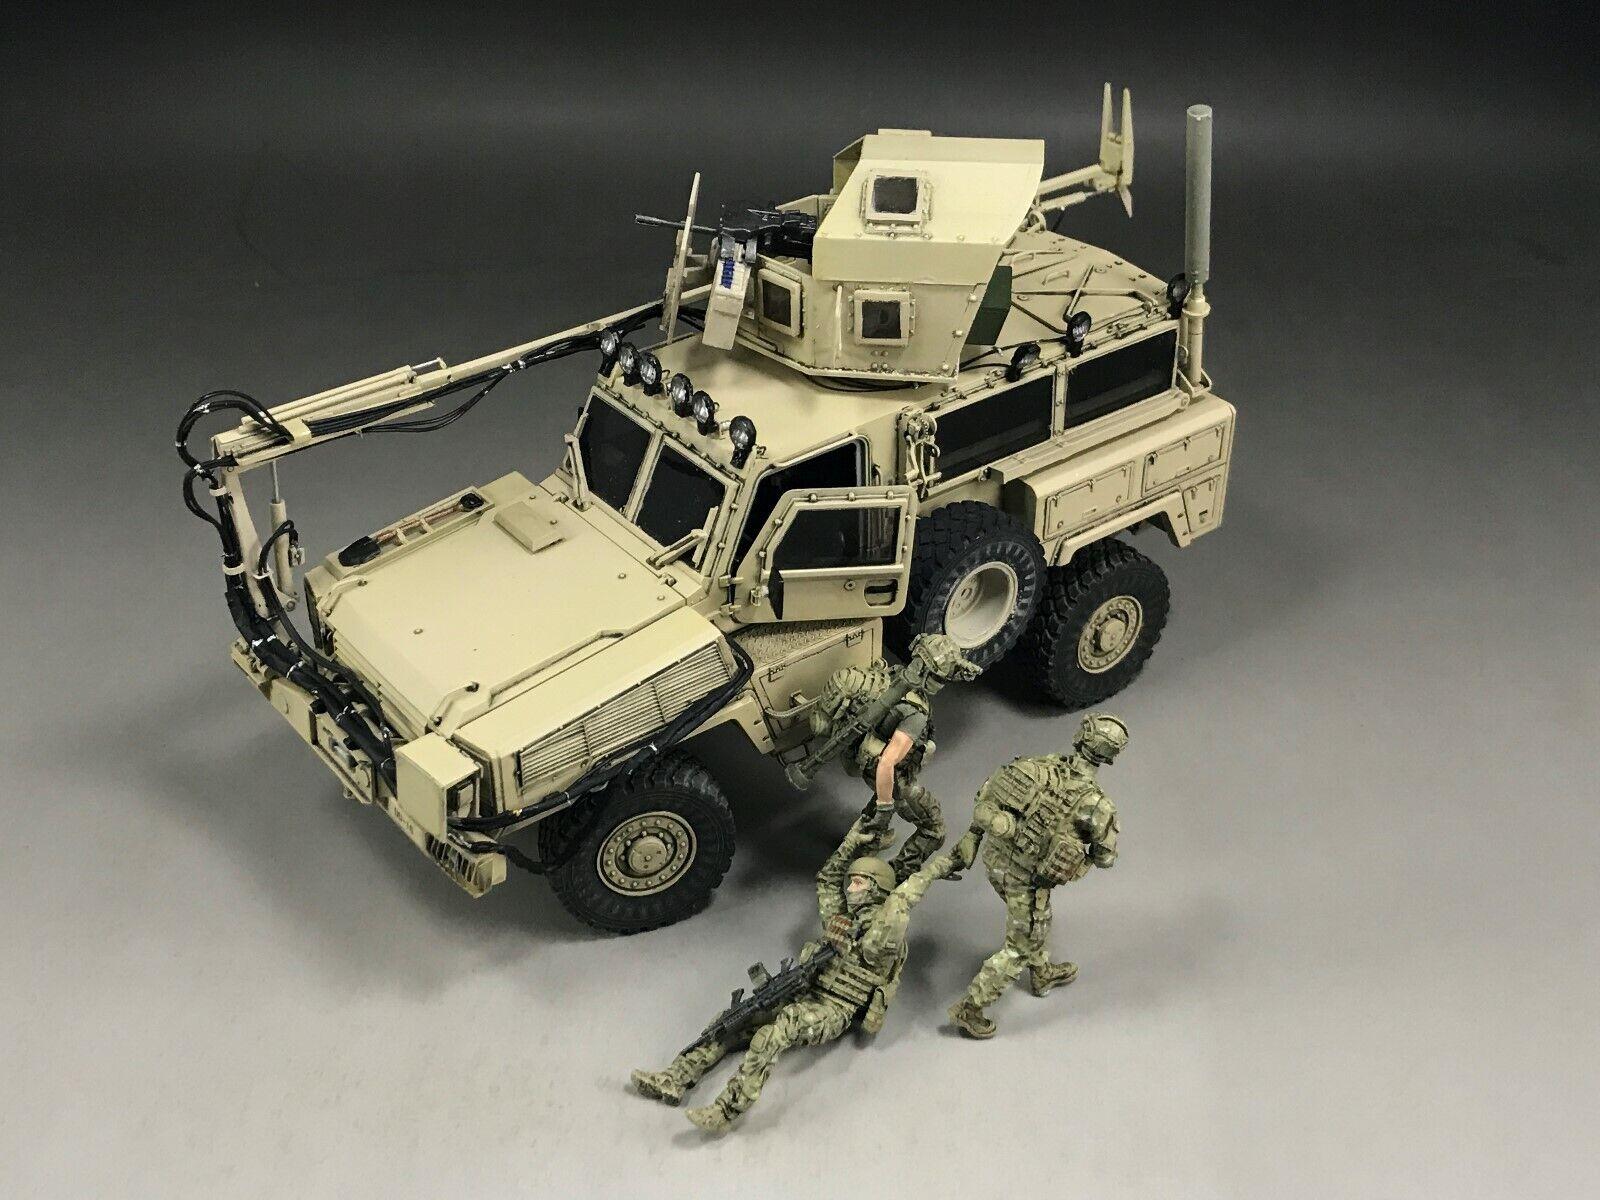 1  35 Built Kinetic 61015 U.S. RG -31 Mk5 MRAP Transportfordon modelllllerlerl (Pipes &Wires)